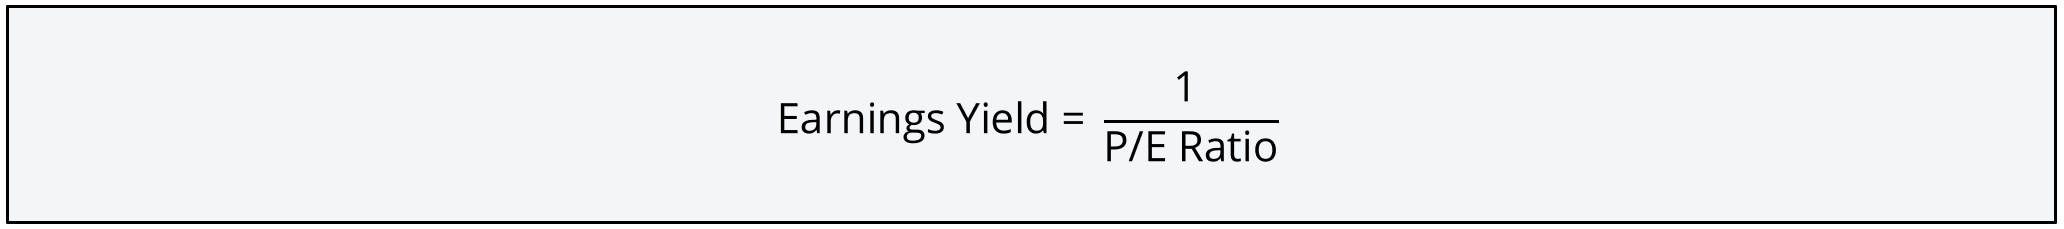 Earnings Yield Formula 2